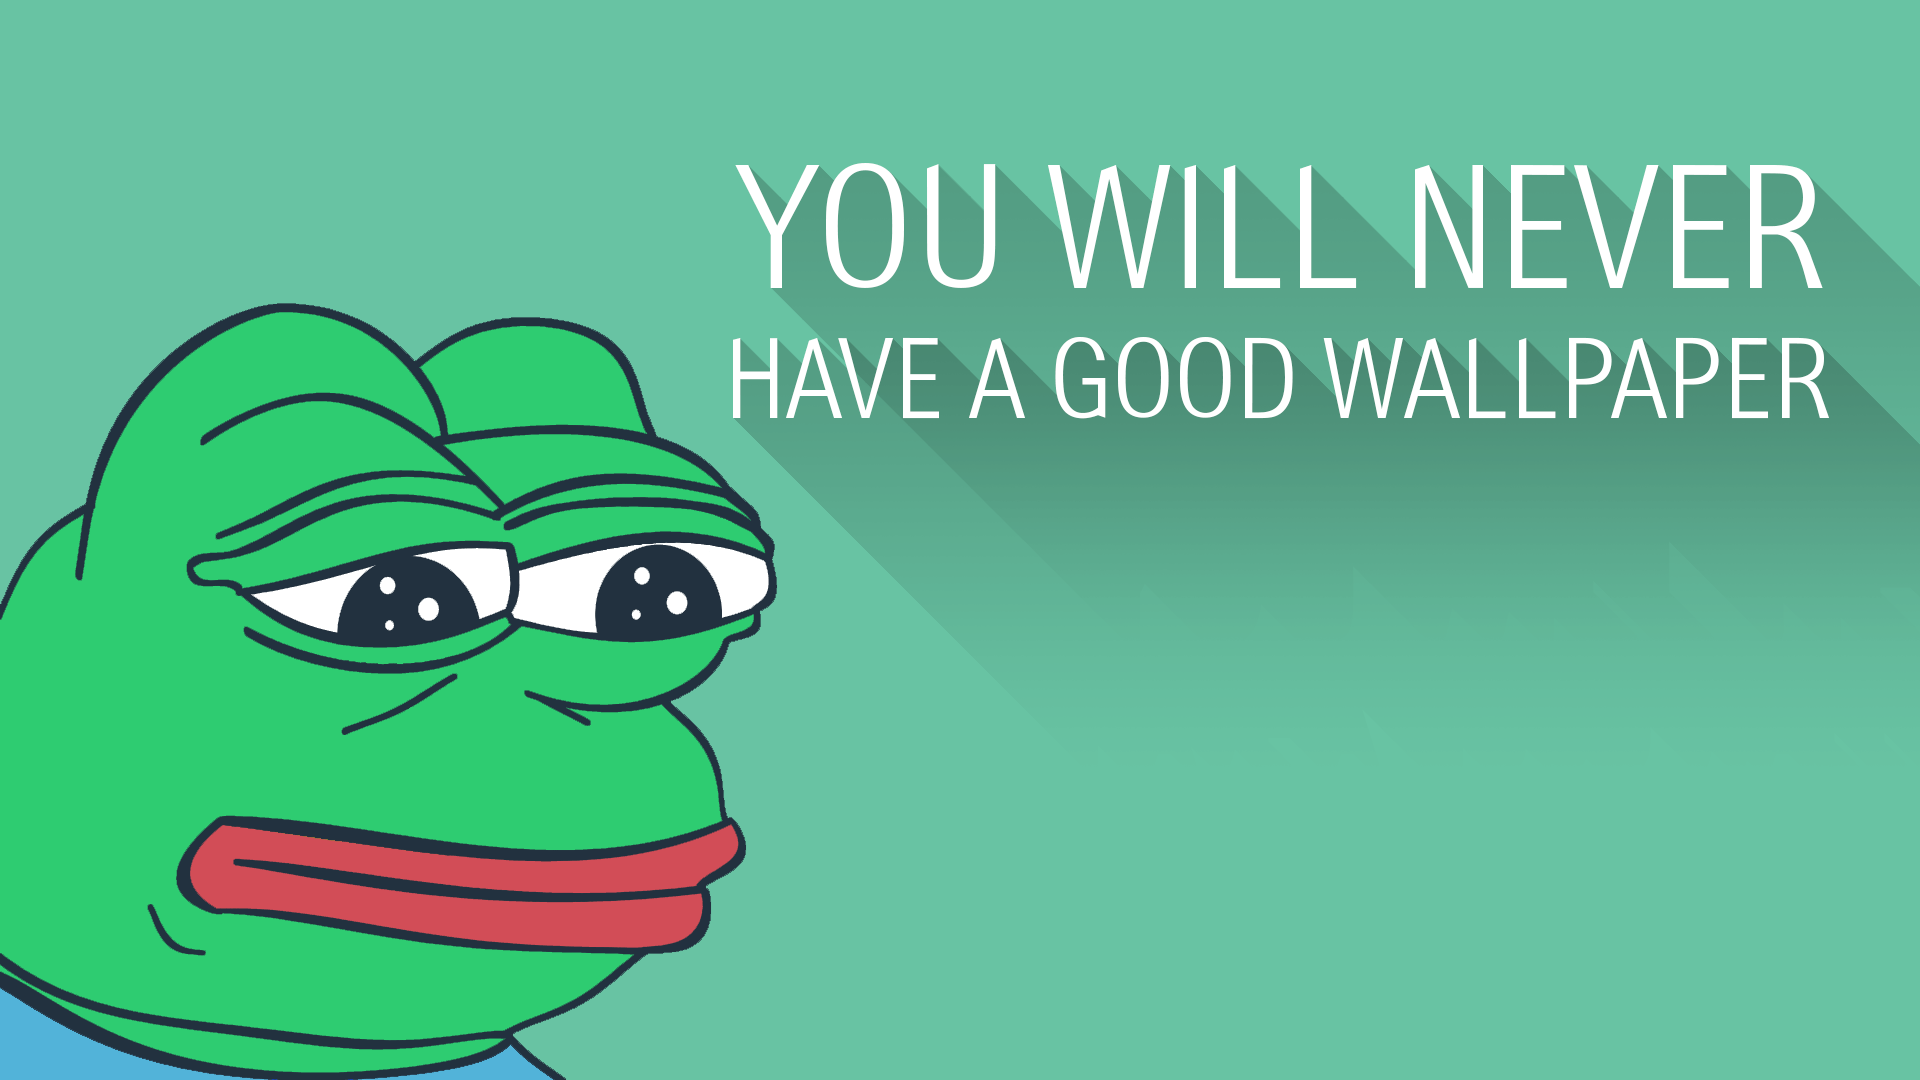 the pepe frog wallpaper - photo #11